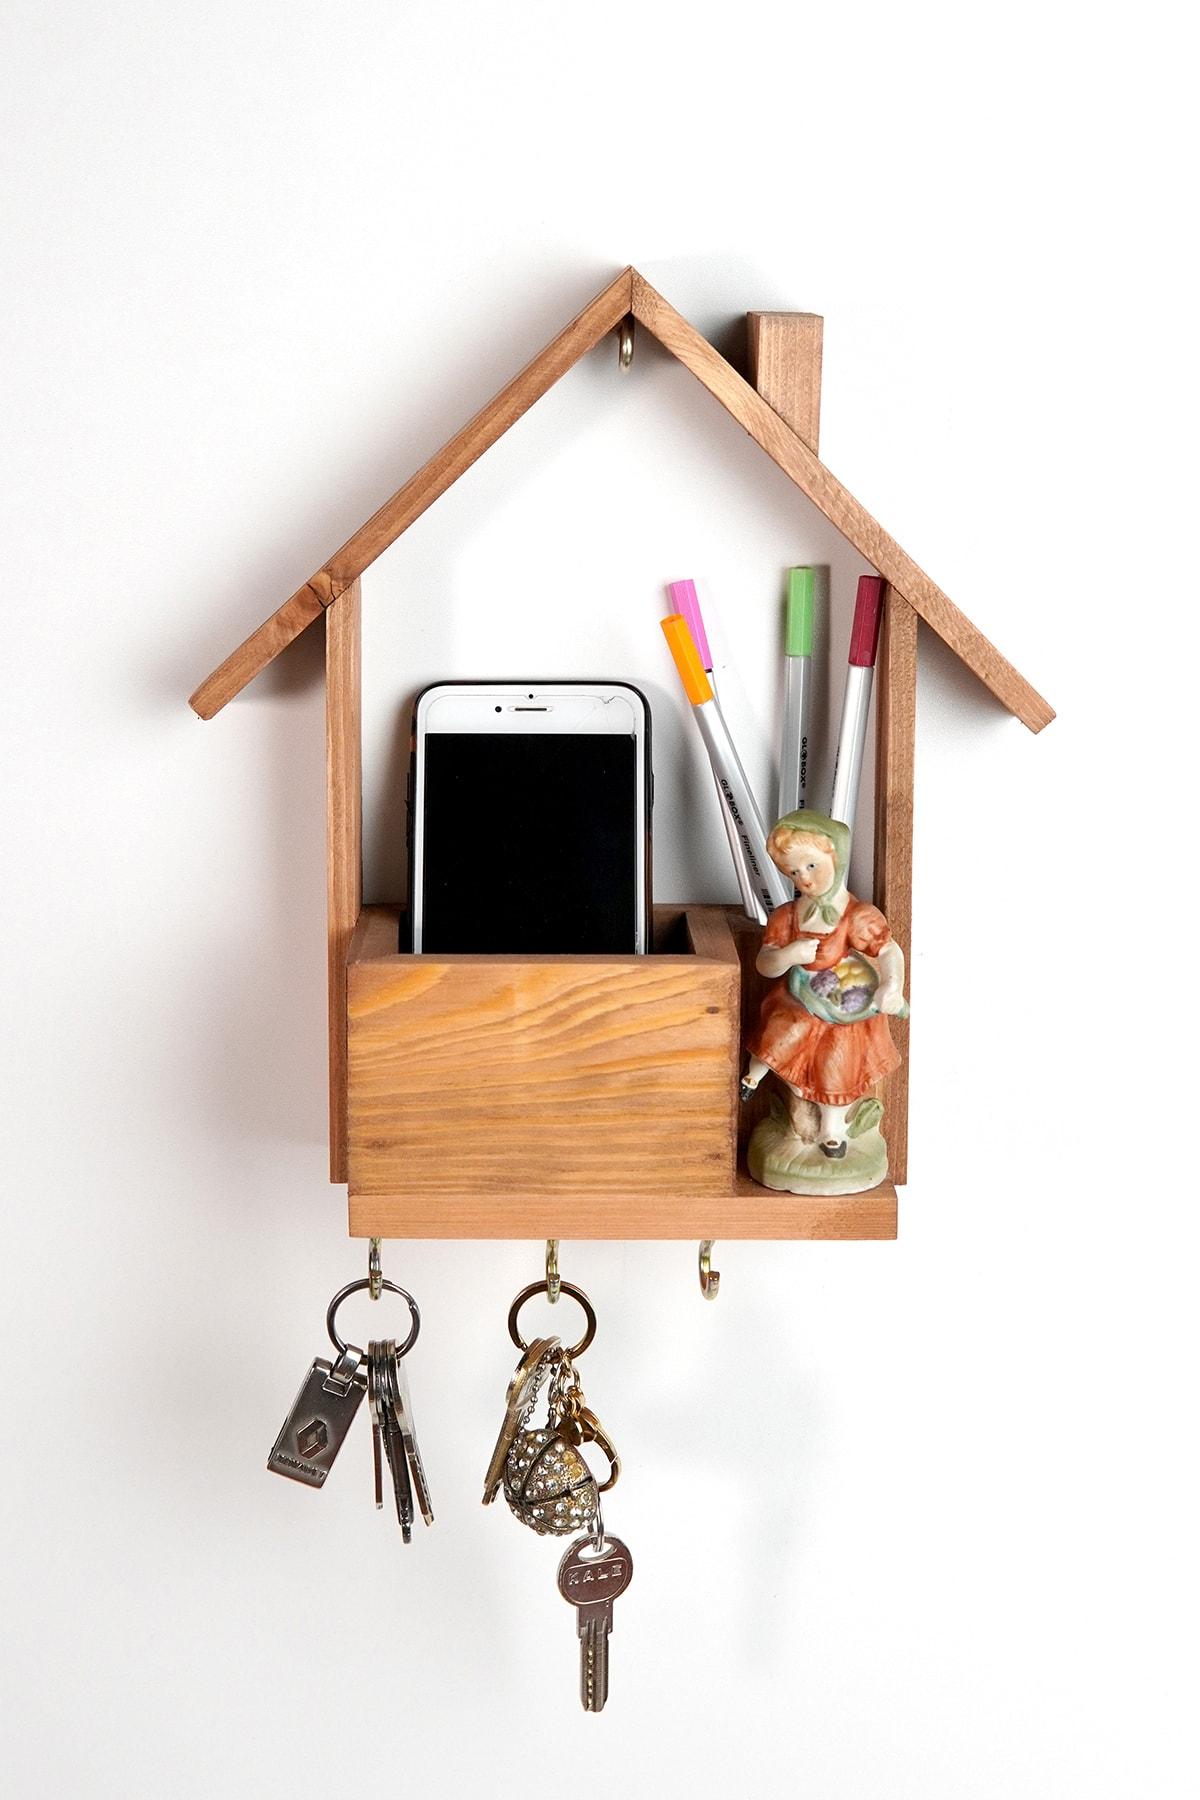 Light Walnut Natural Wood Pine Decorative House Shaped Multifunctional Keychain Rack Handmade